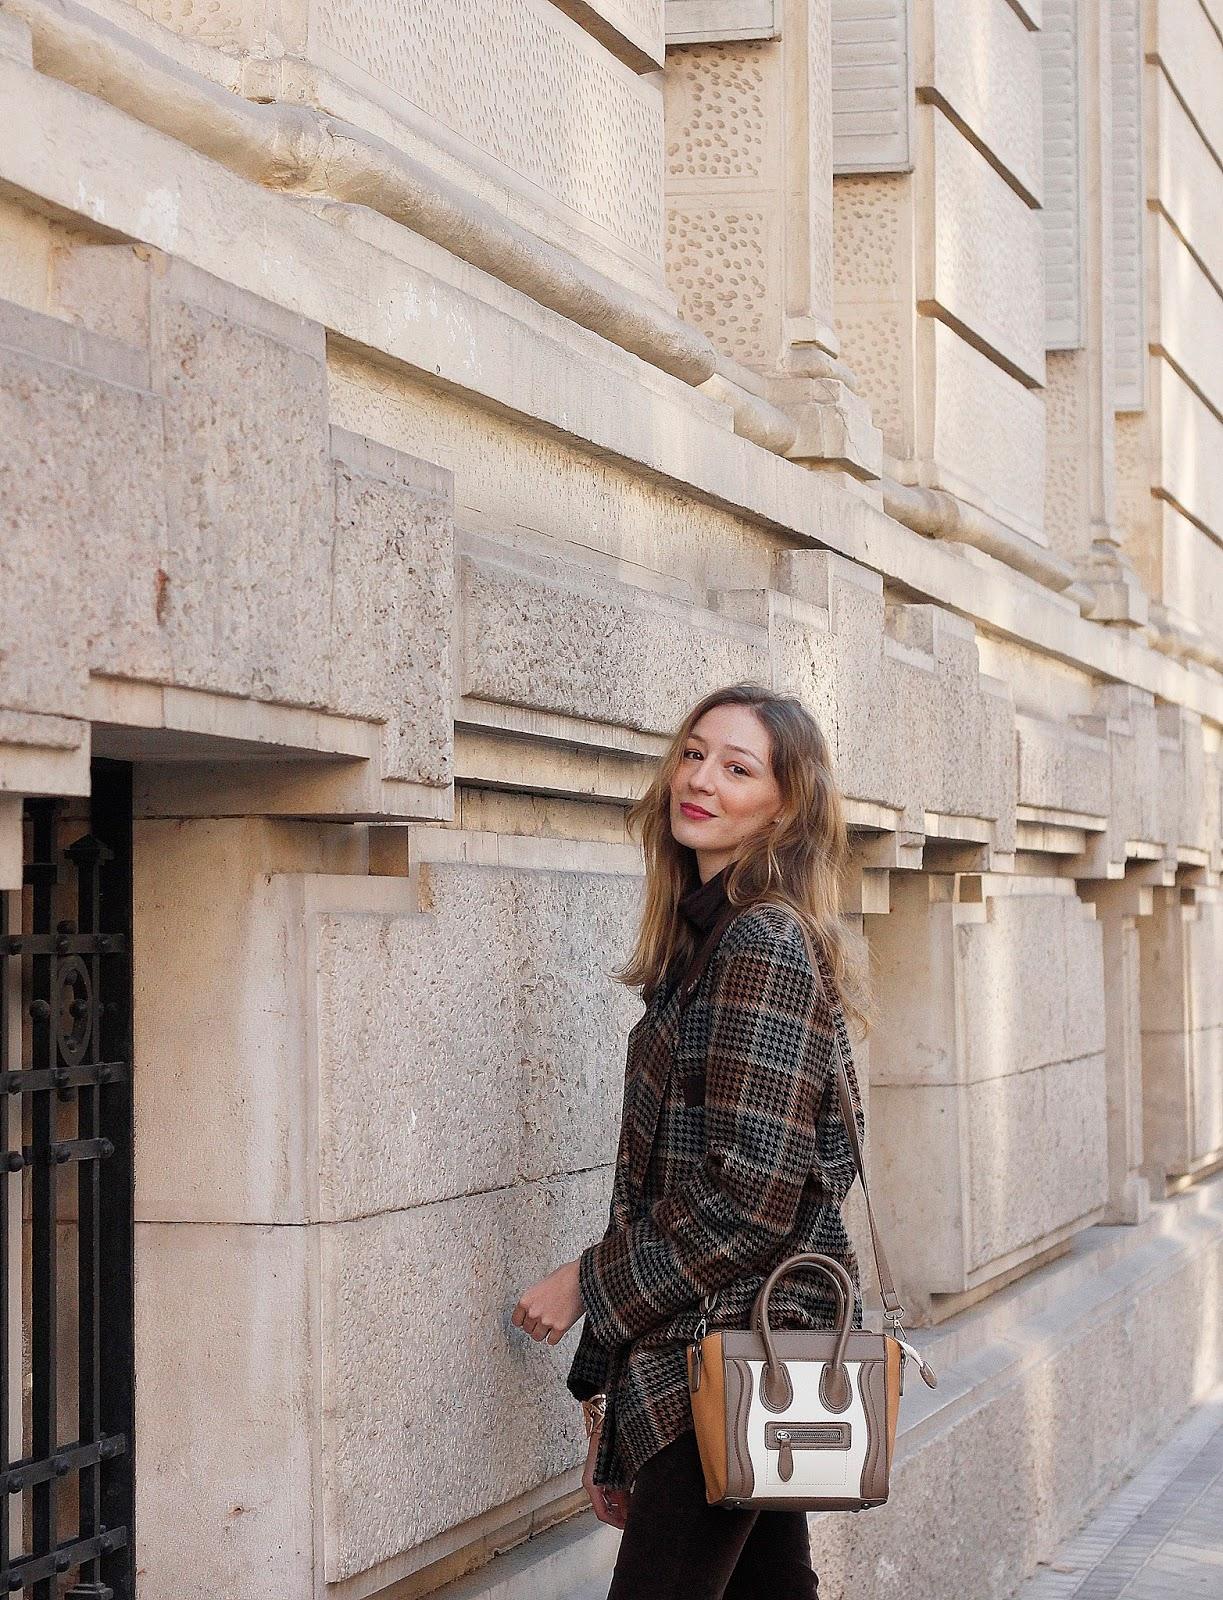 corduroy-pants-wales-jacket-celine-bag-street-style